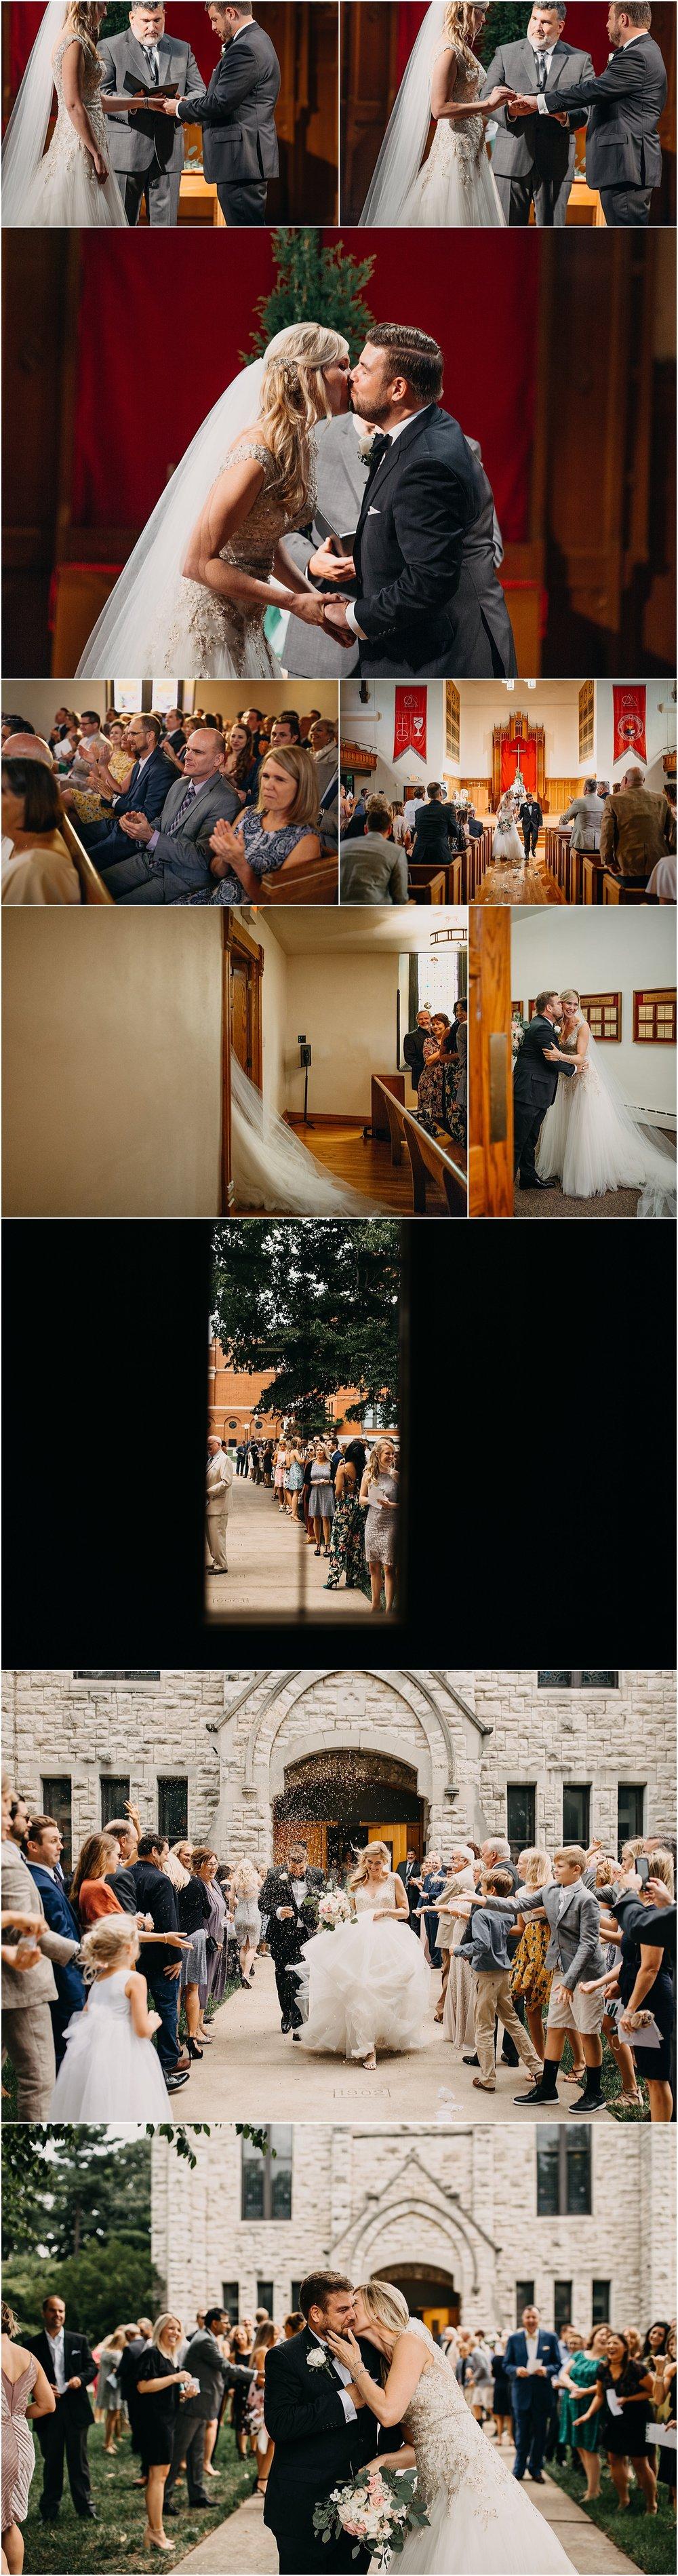 lindsay-jeff-missouri-wedding-photographer_0010.jpg